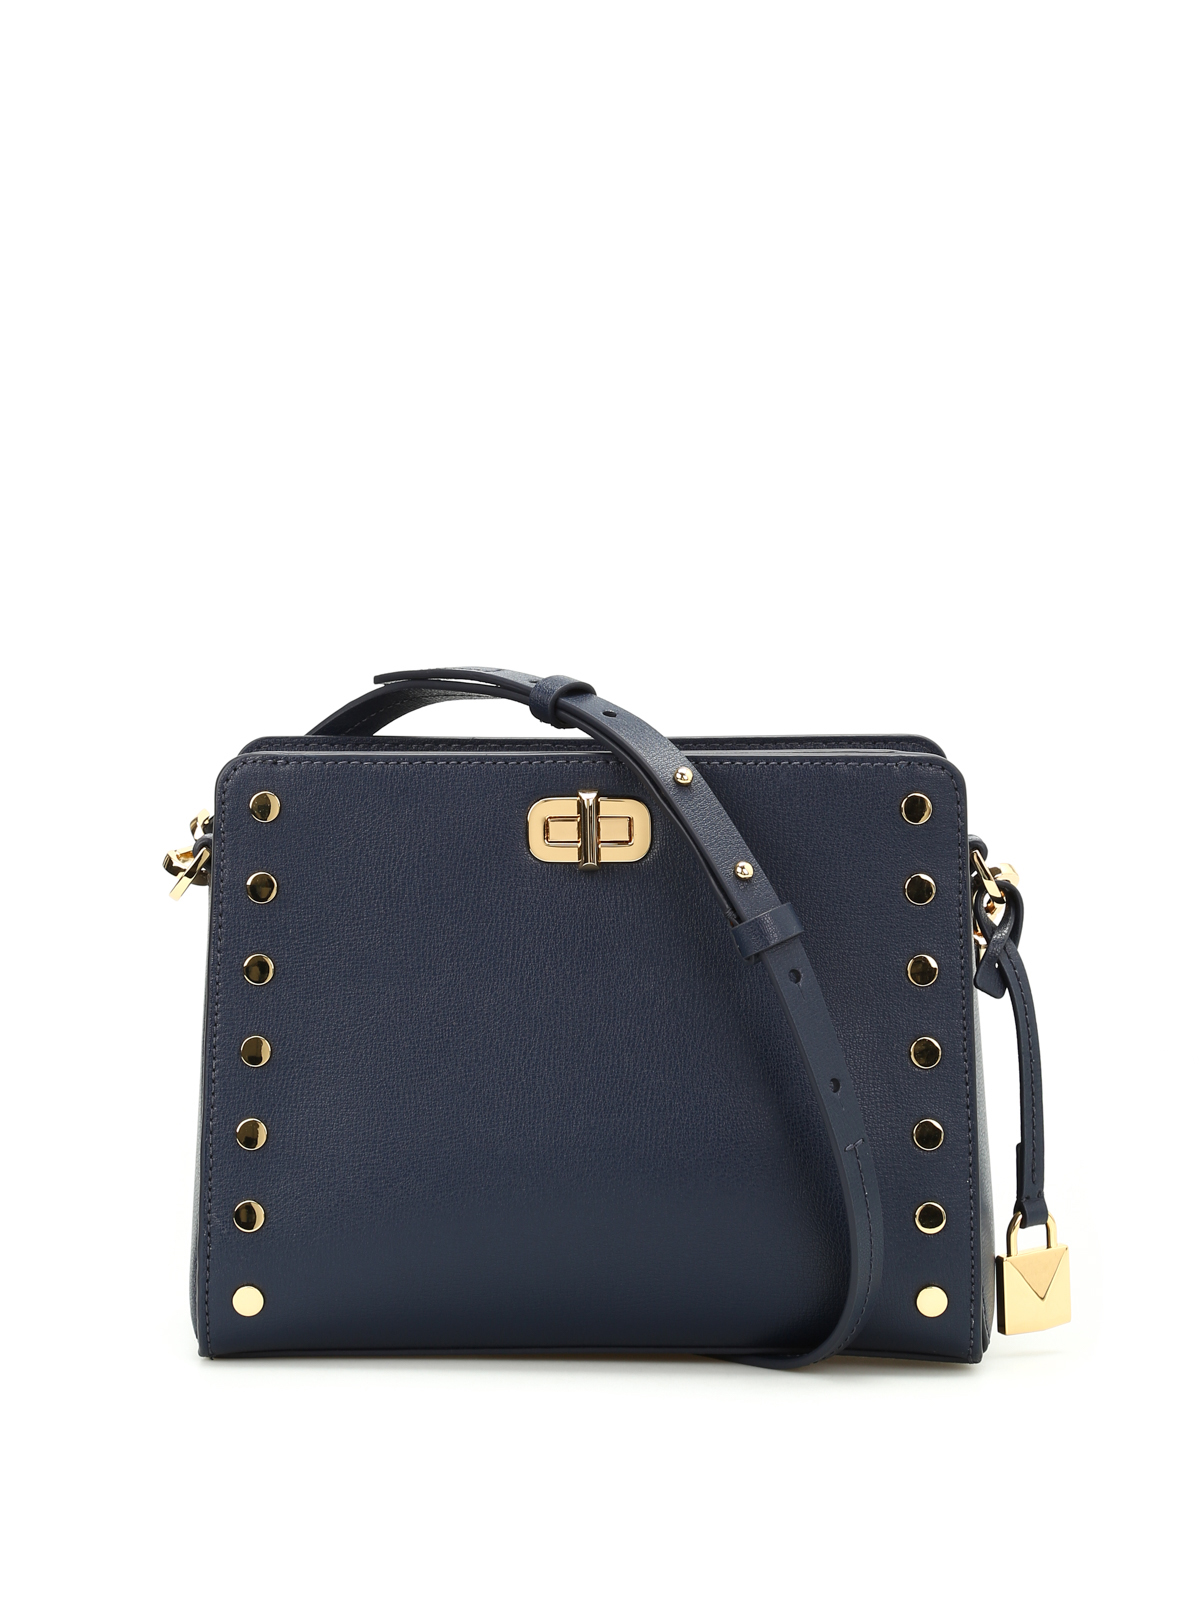 46999f39fdb5 Michael Kors - Sylvie studded messenger bag - cross body bags ...